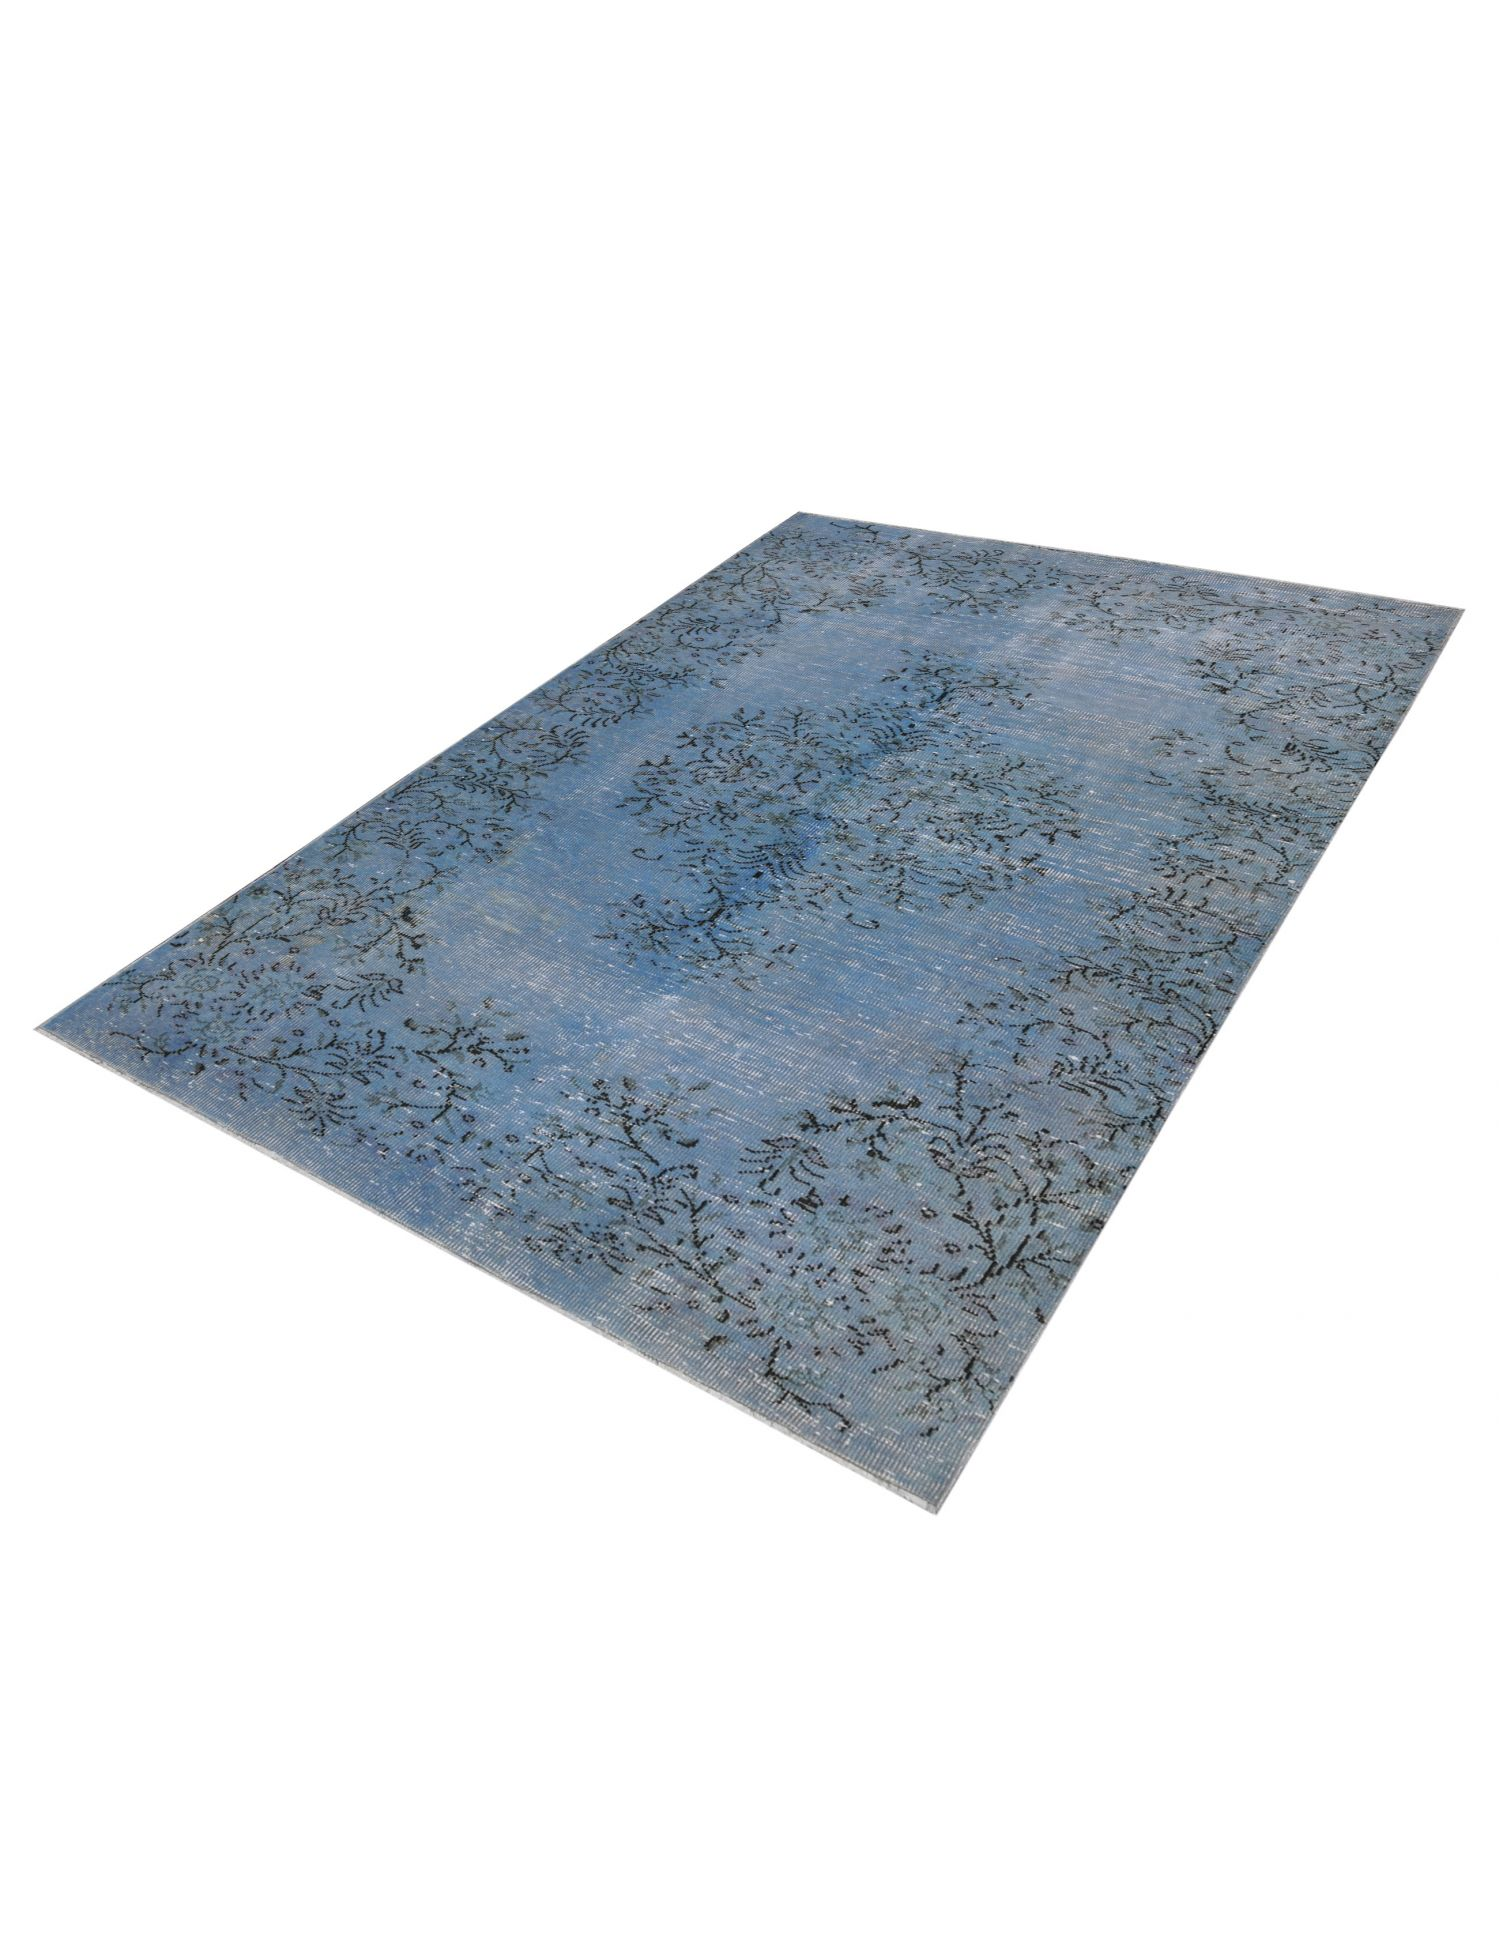 vintage teppich türkis   blau <br/>270 x 162 cm